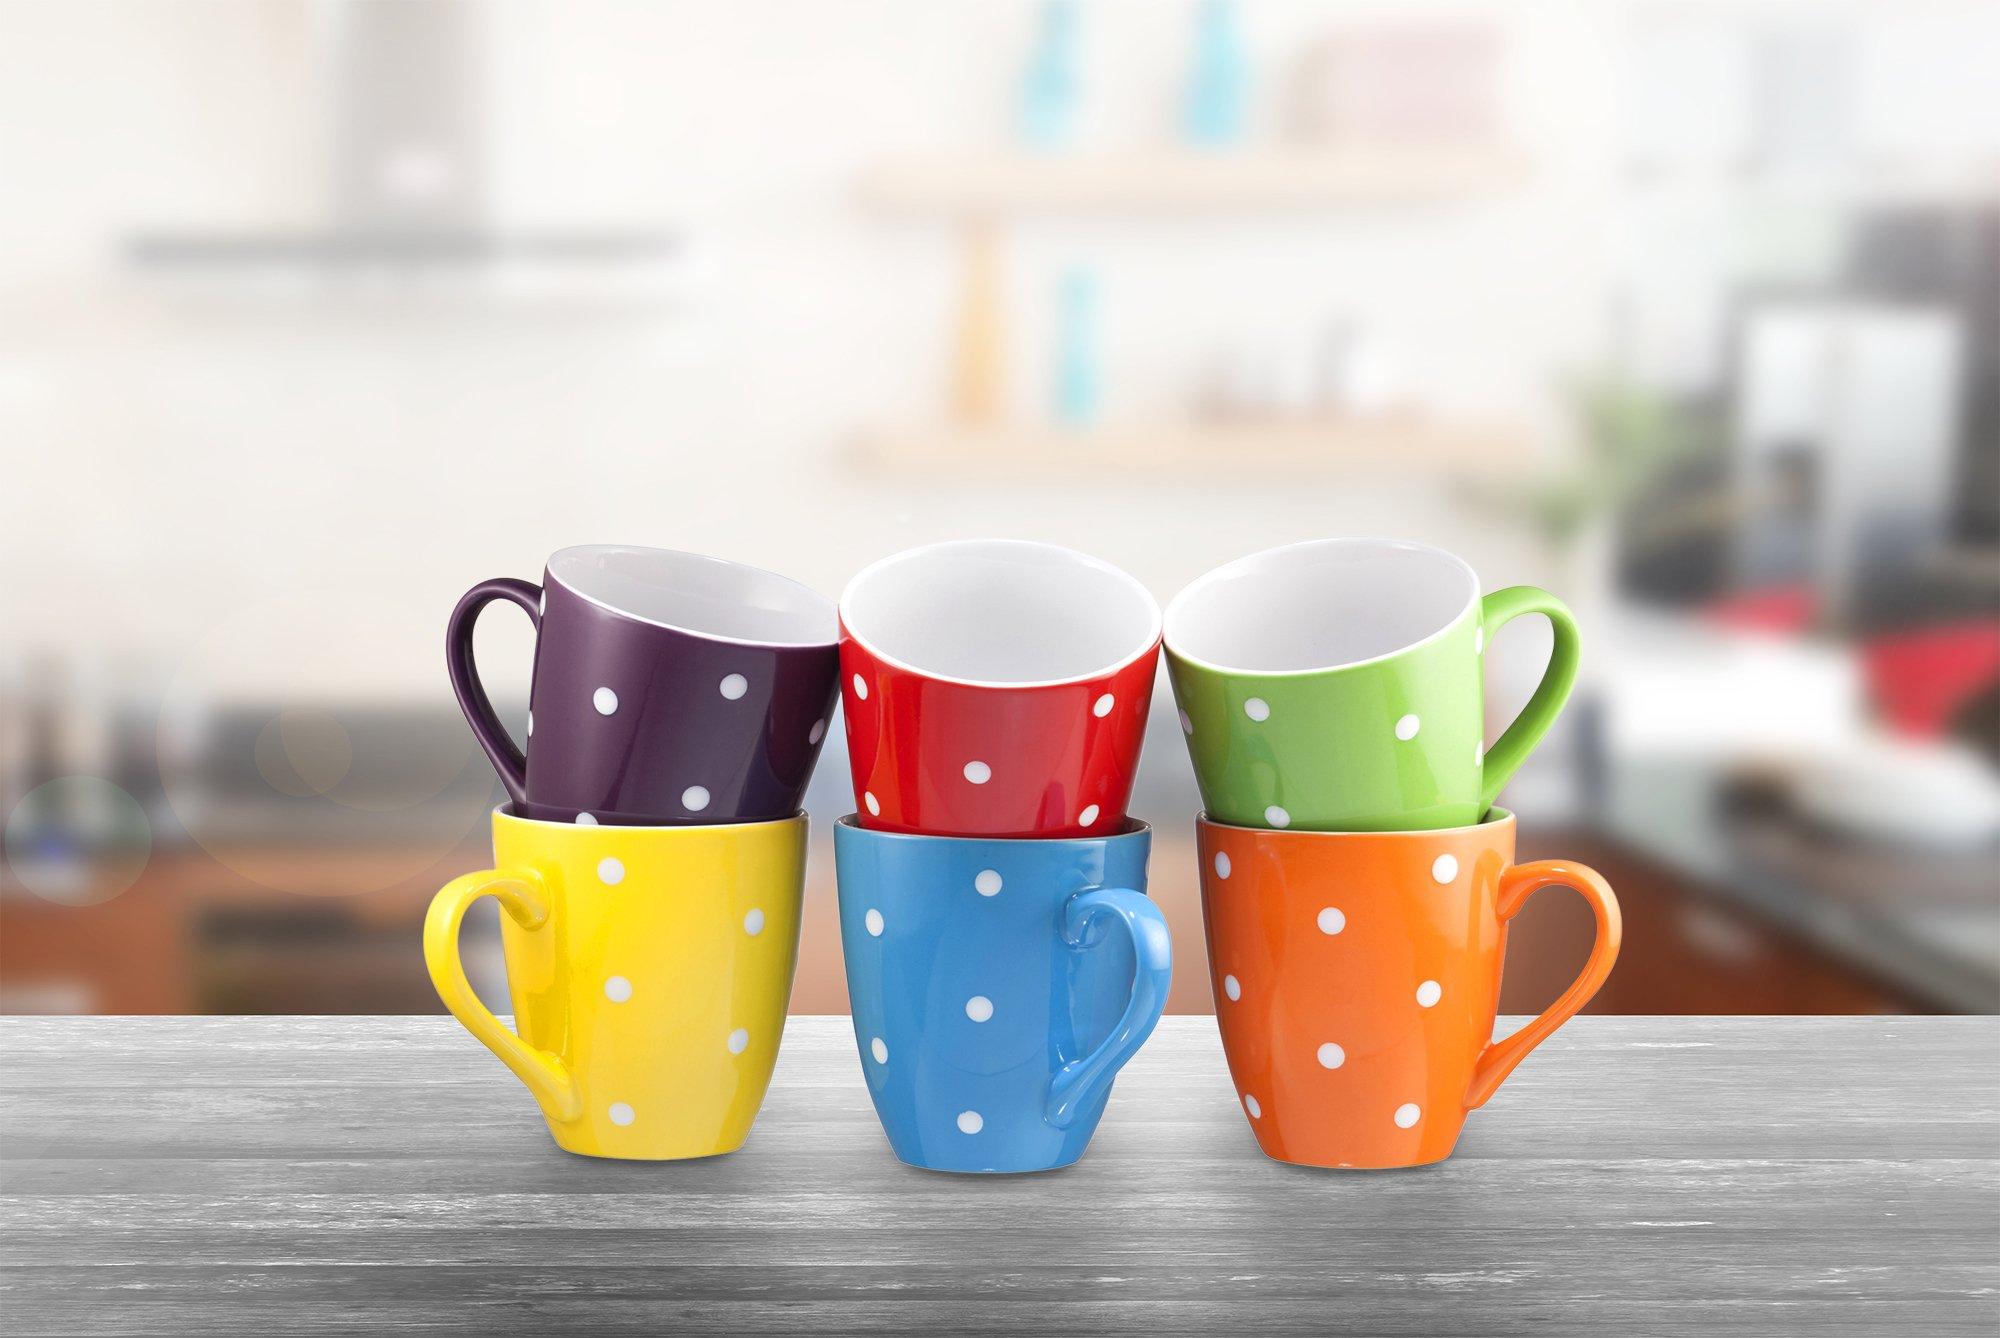 Coffee Mug Set Set of 6 Large-sized 16 Ounce Ceramic Coffee Mugs Restaurant Coffee Mugs By Bruntmor (Polka Dot) by Bruntmor (Image #7)